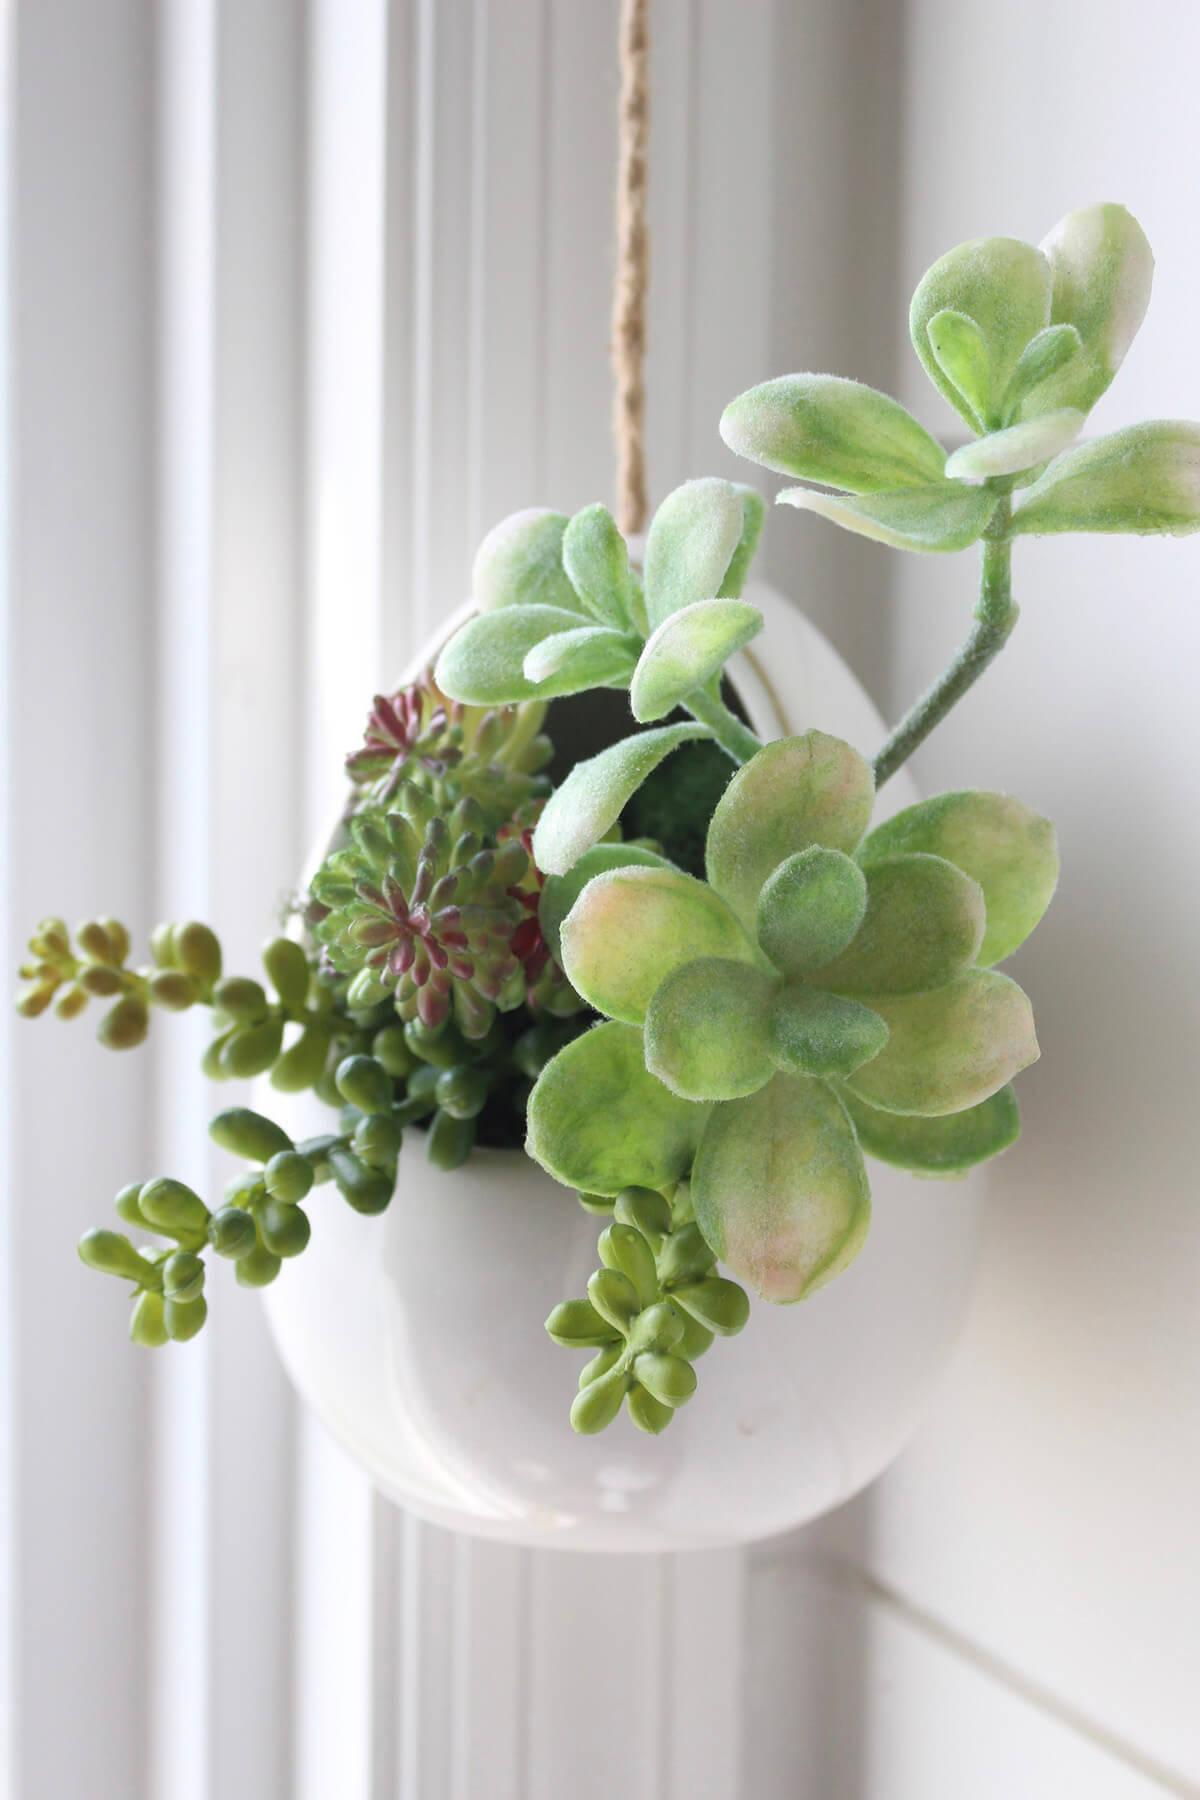 One-of-a-Kind Hanging Succulent Arrangement